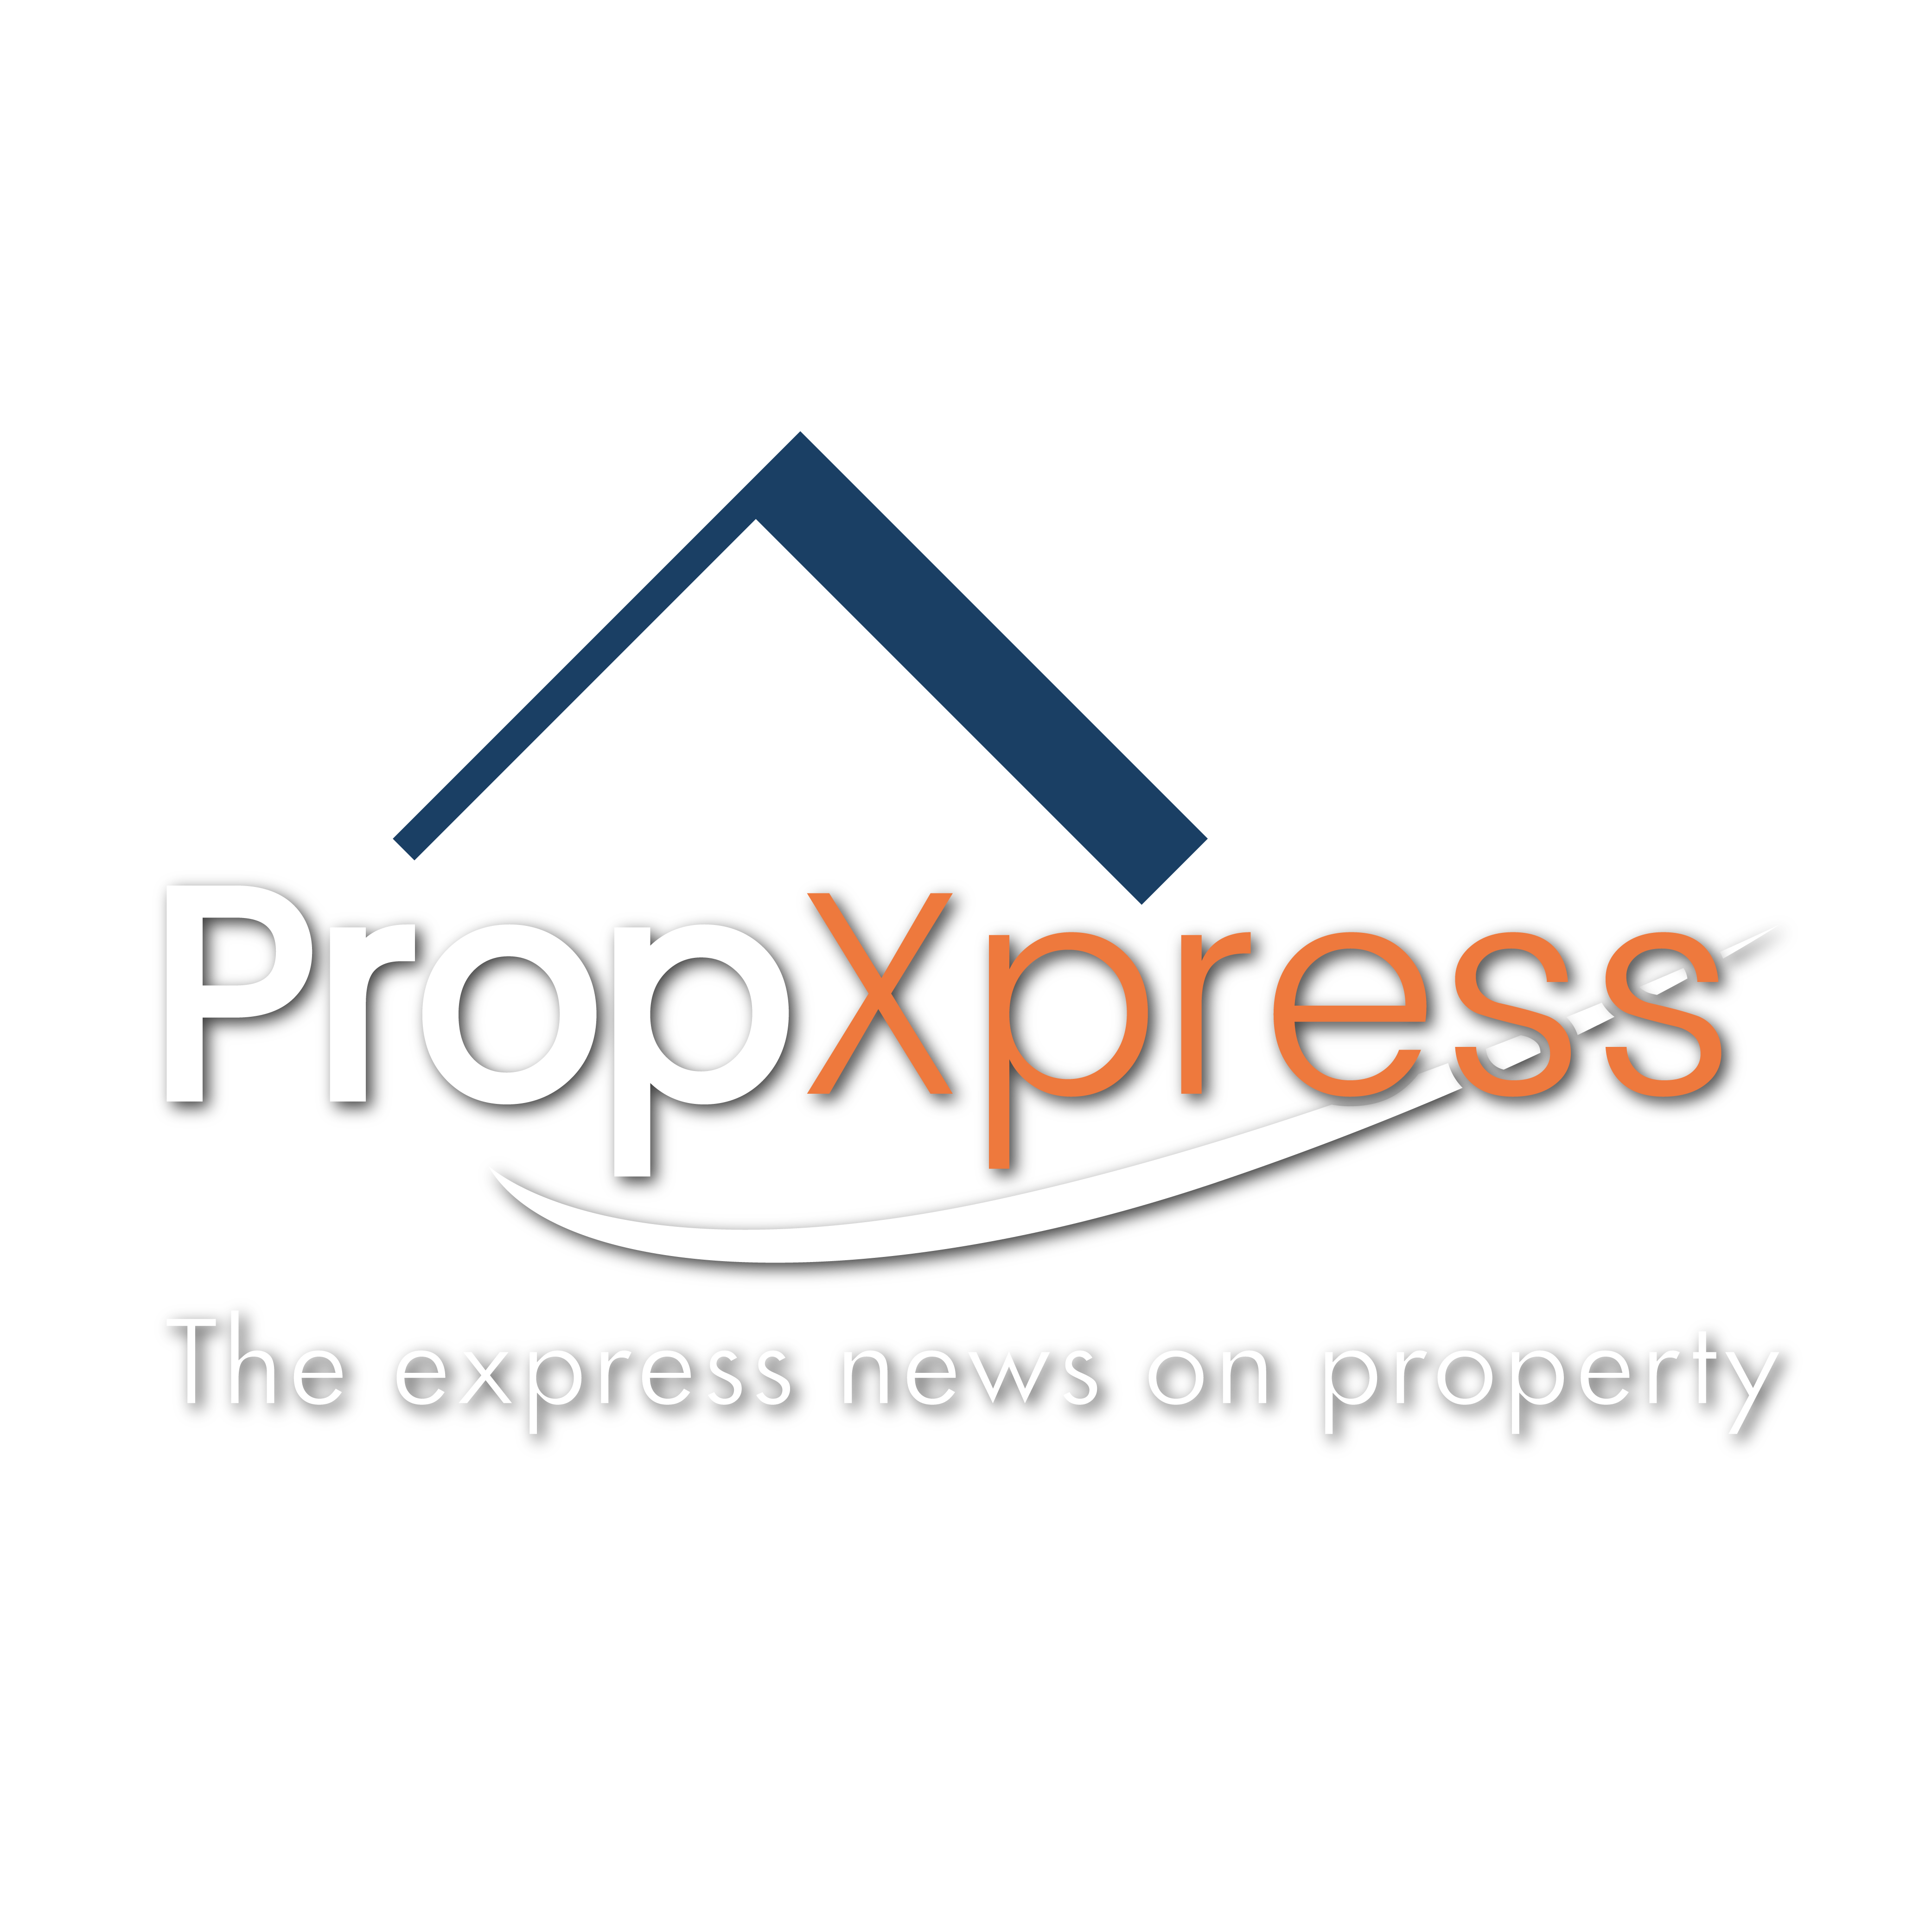 PropXpress